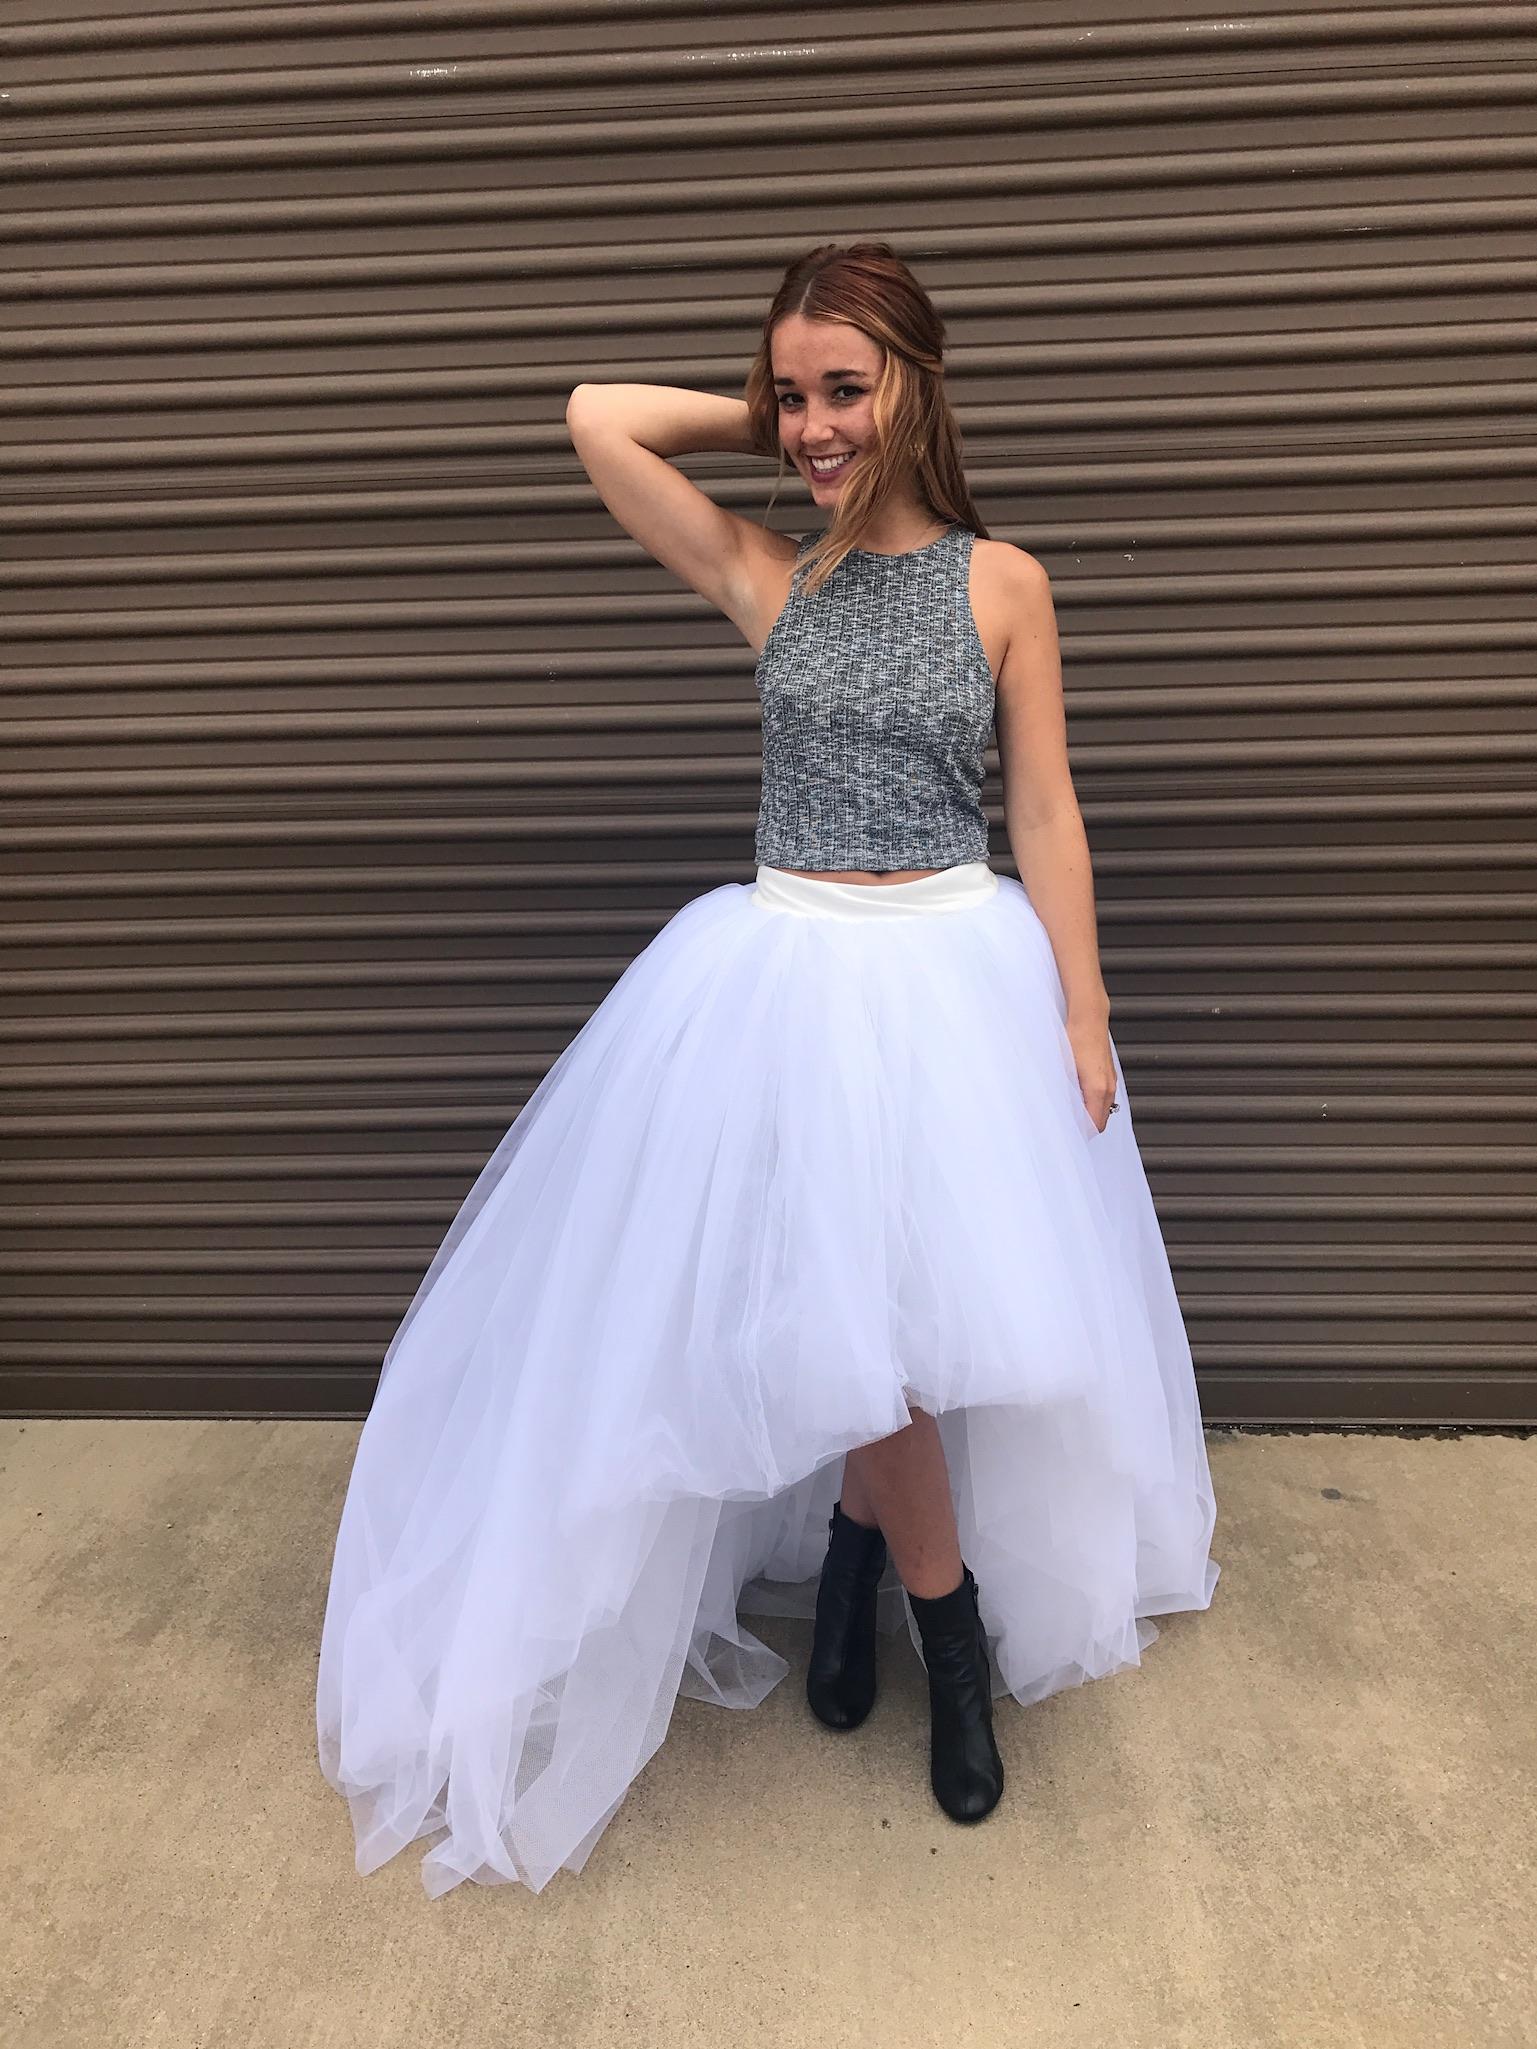 'Sailor Skirt' by Houghton